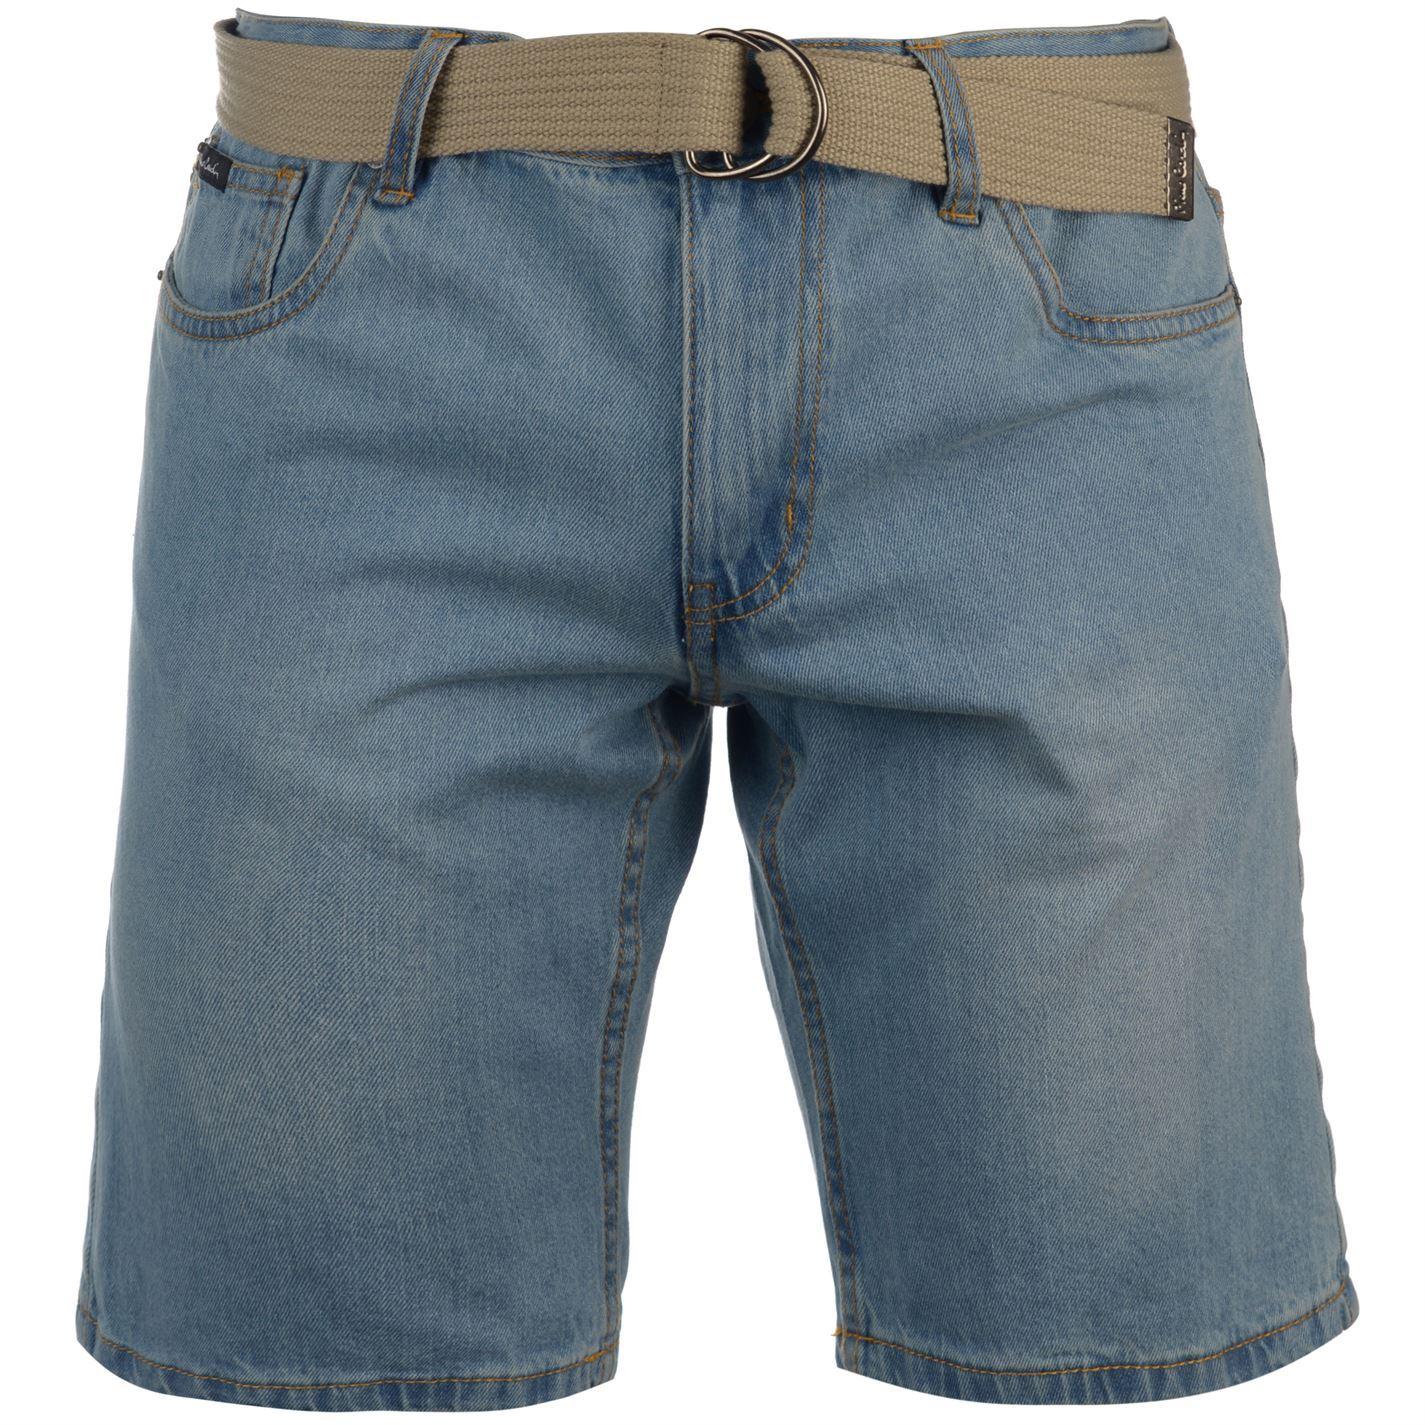 Pierre-Cardin-Mens-Denim-Web-Belt-Shorts-Pants-Trousers-Bottoms-Cotton-Regular